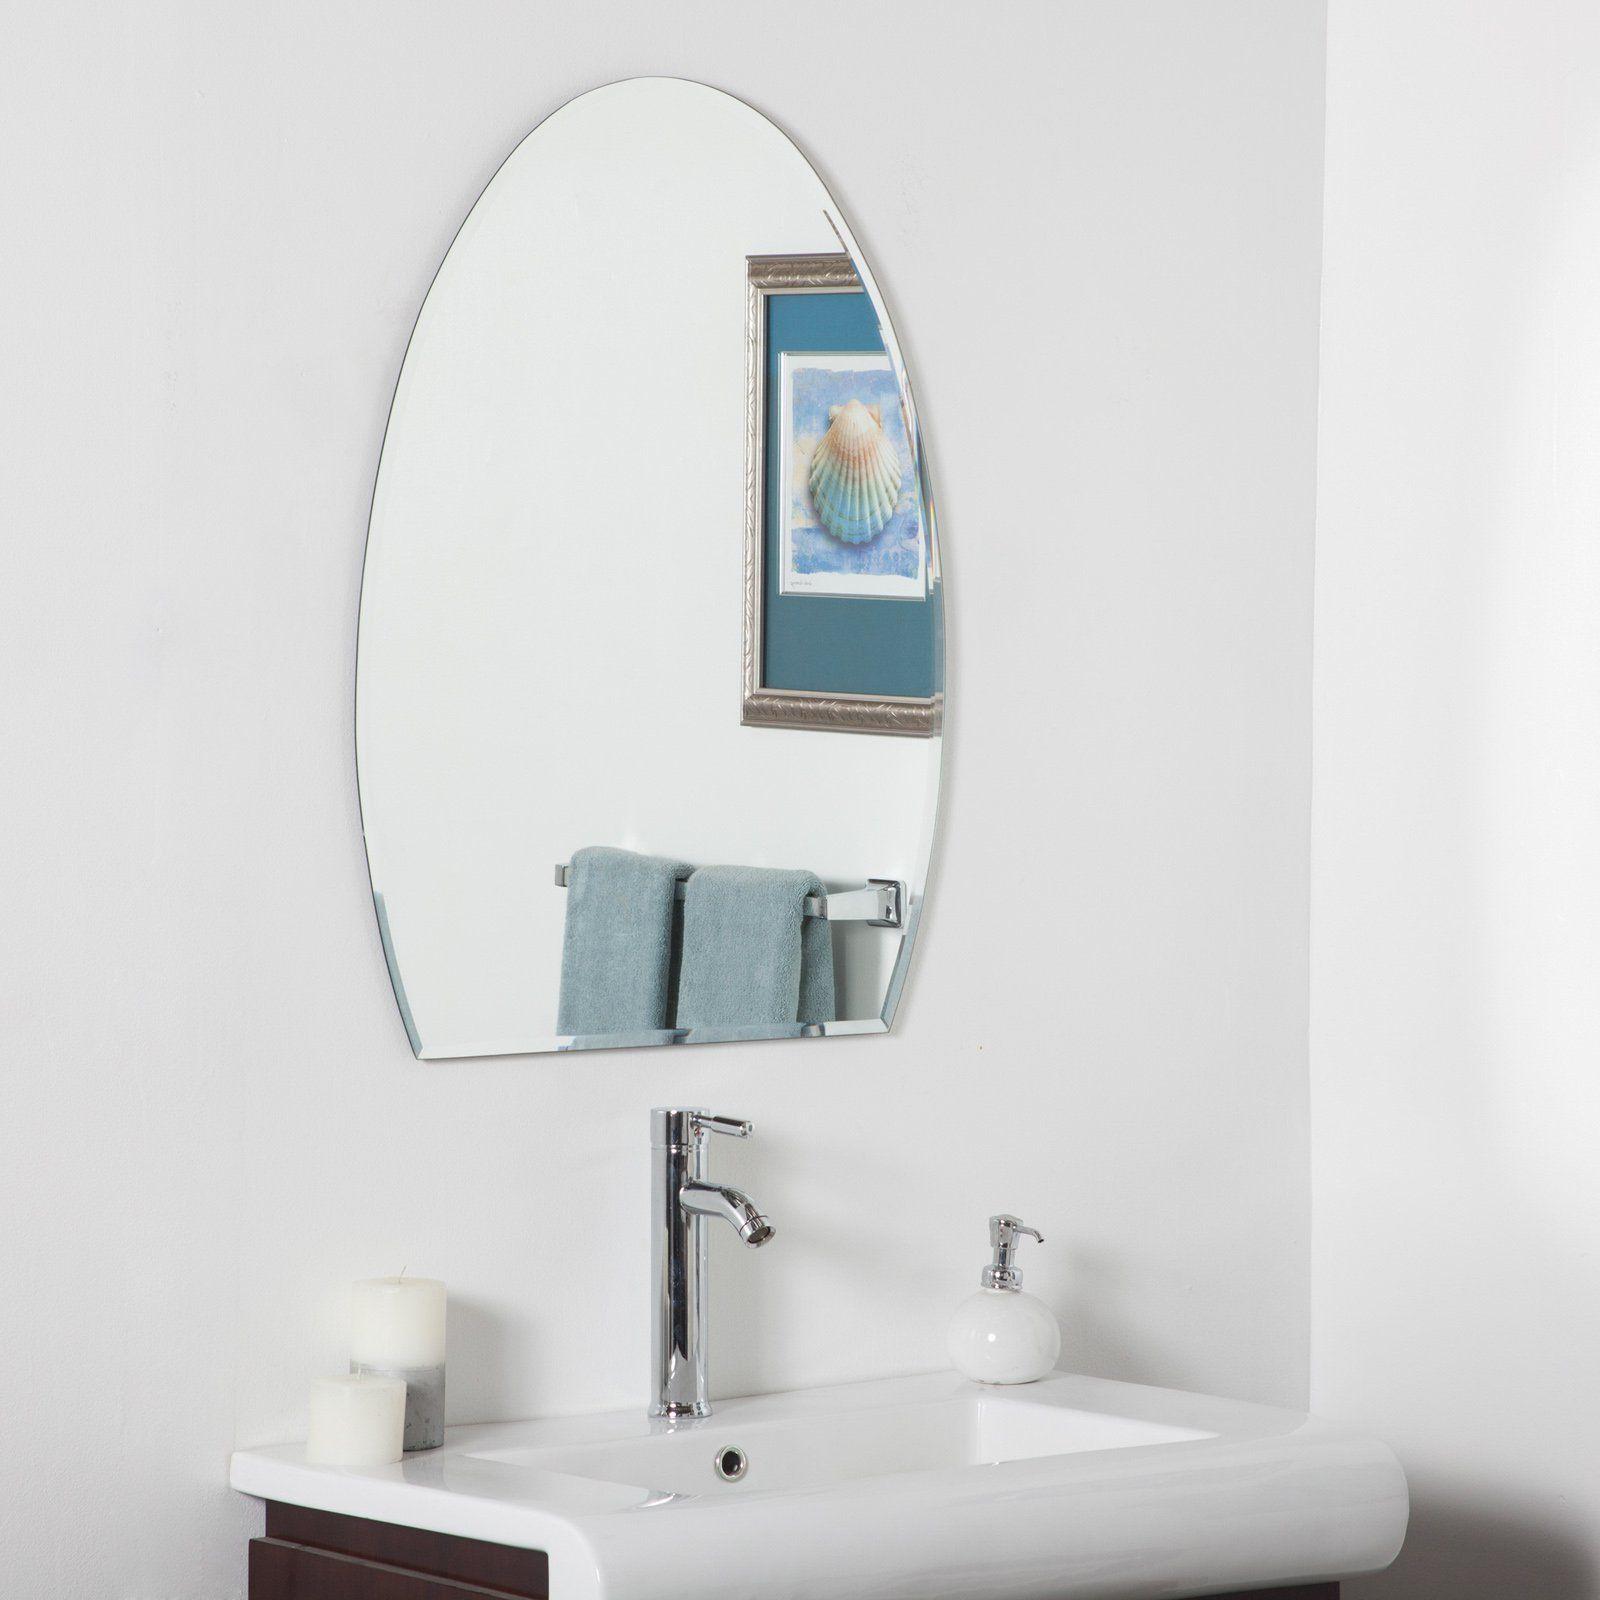 Sena Modern Bathroom Wall Mirror – 24W X 32H In (View 2 of 20)